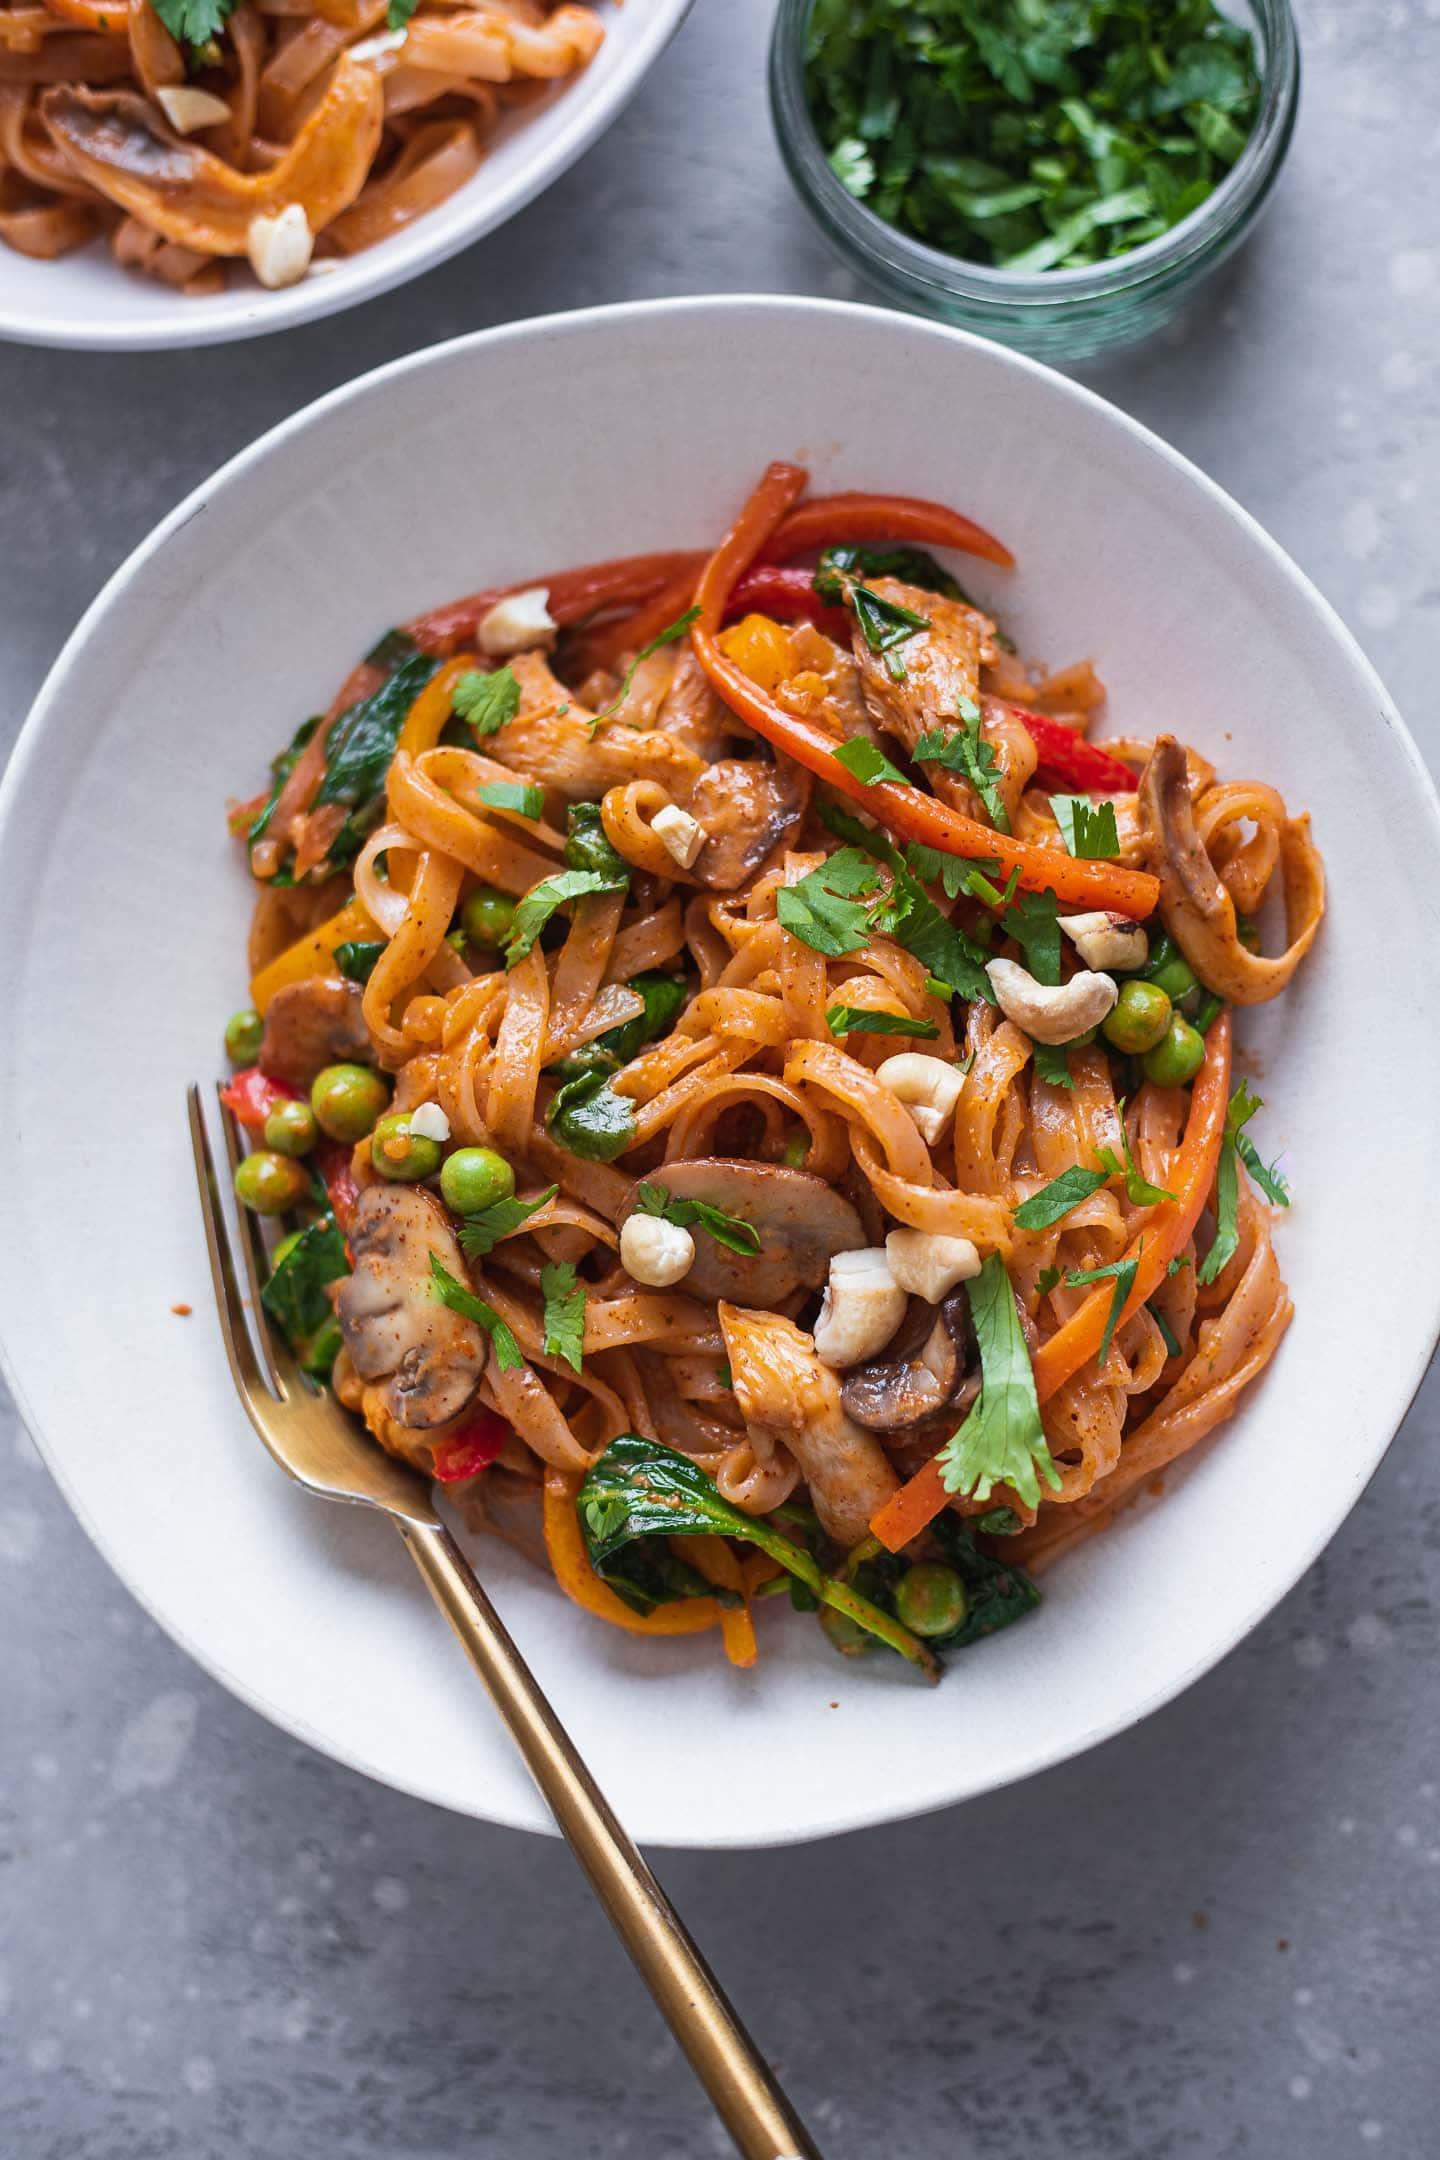 Two bowls of vegetable noodle stir-fry